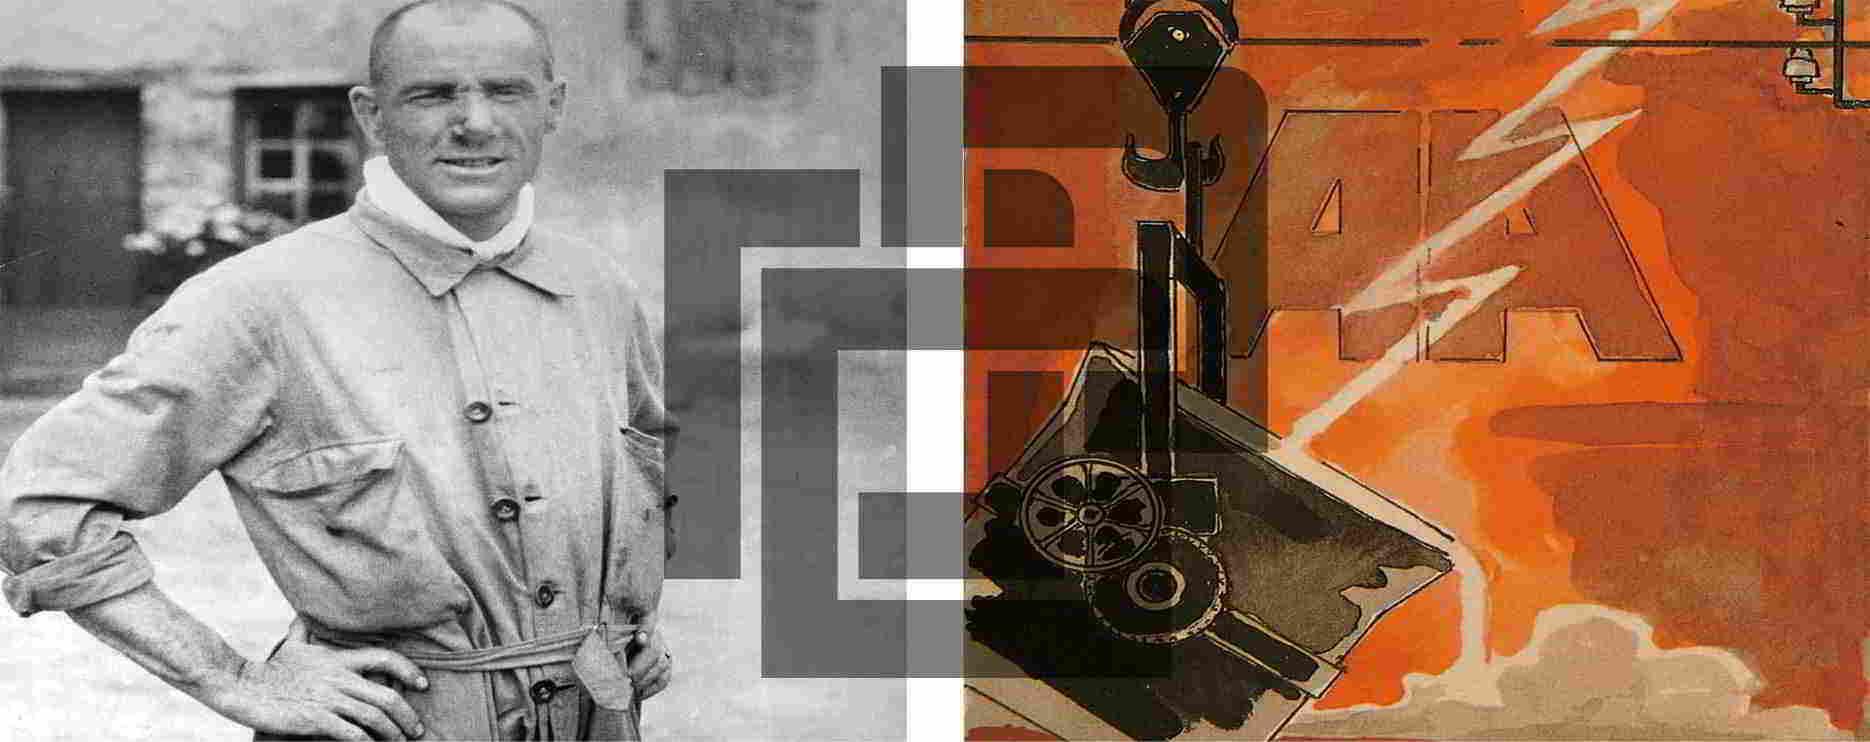 کمپانی فولادسازی دنیلی ایتالیا چگونه دنیلی شد!